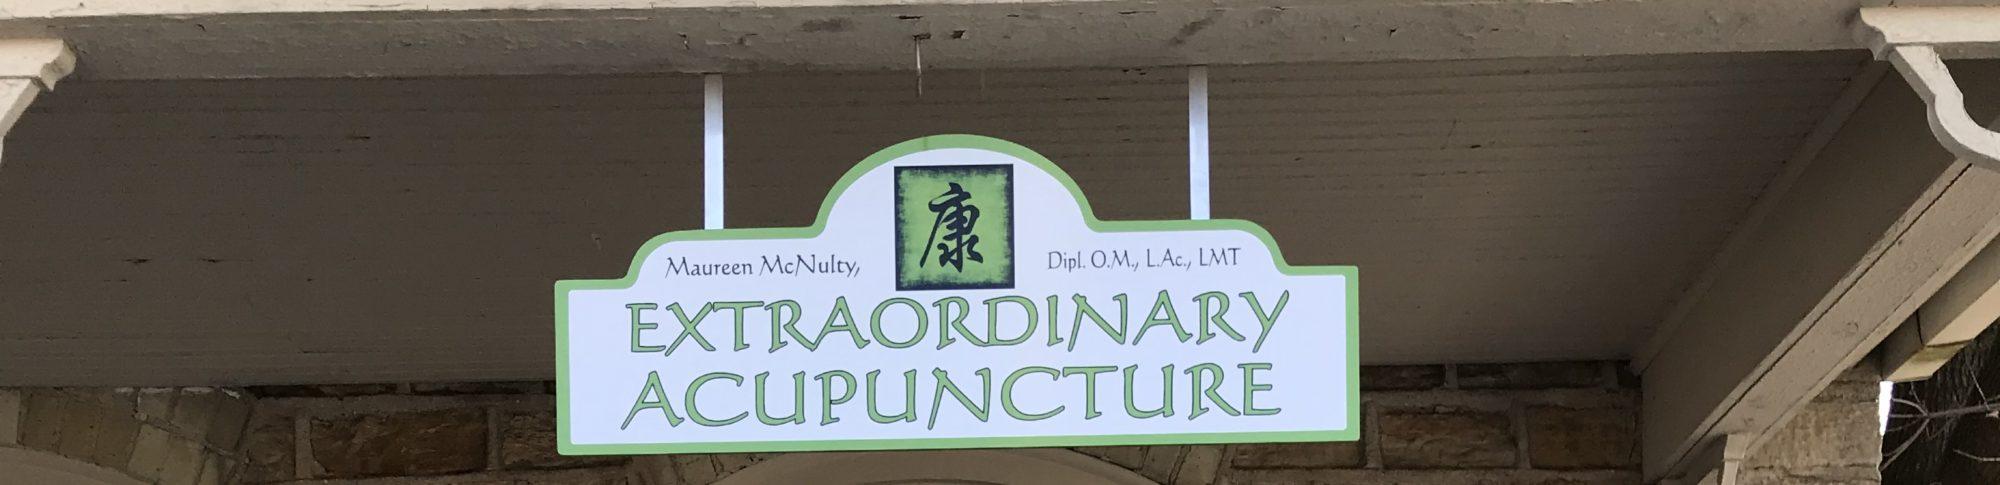 Extraordinary Acupuncture